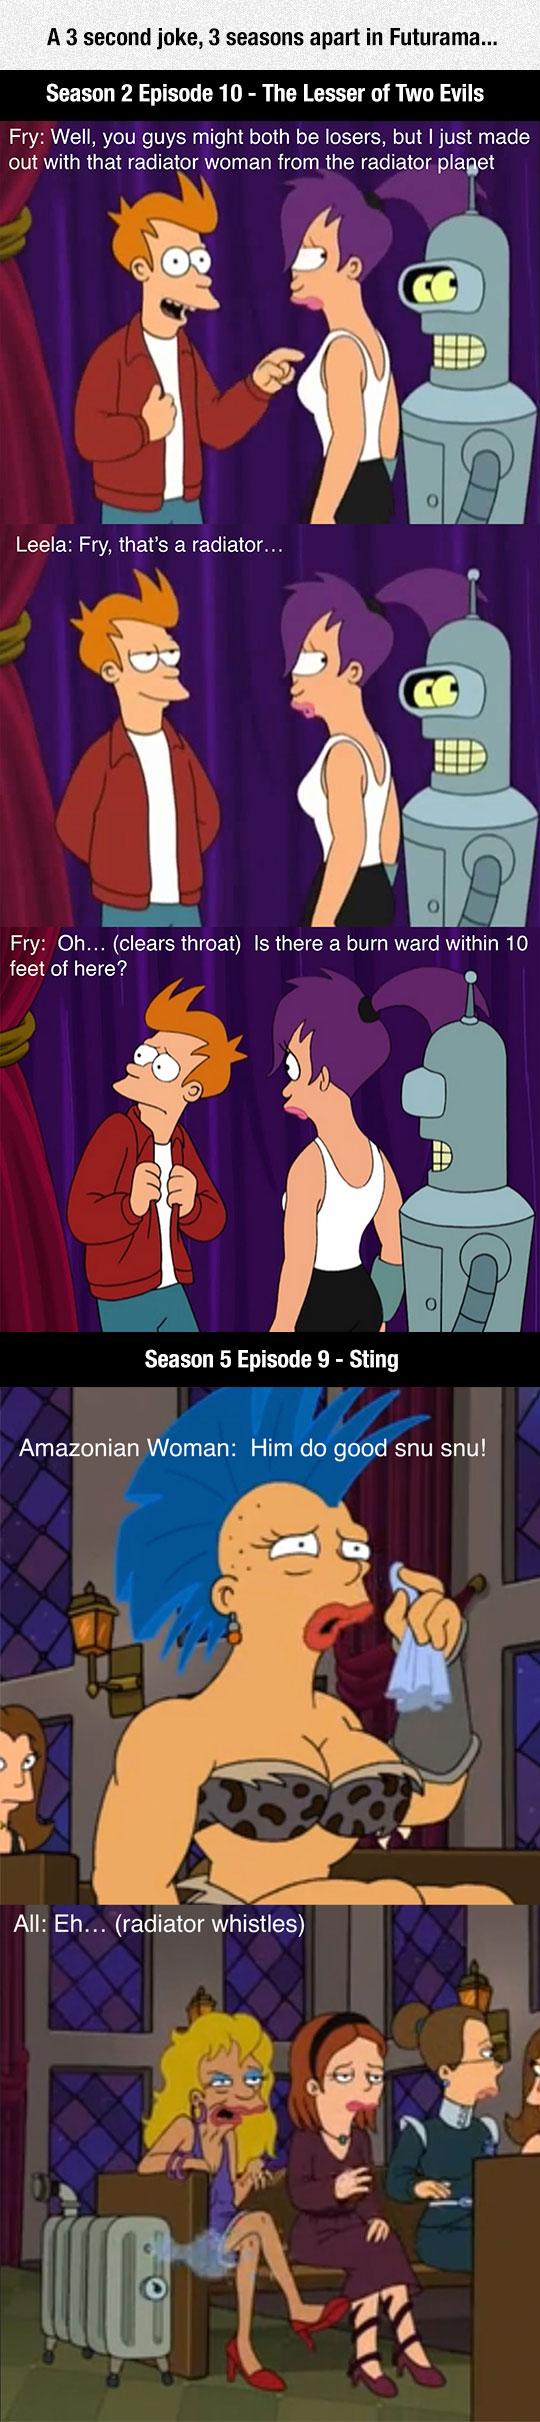 funny-Futurama-radiator-Fry-couple